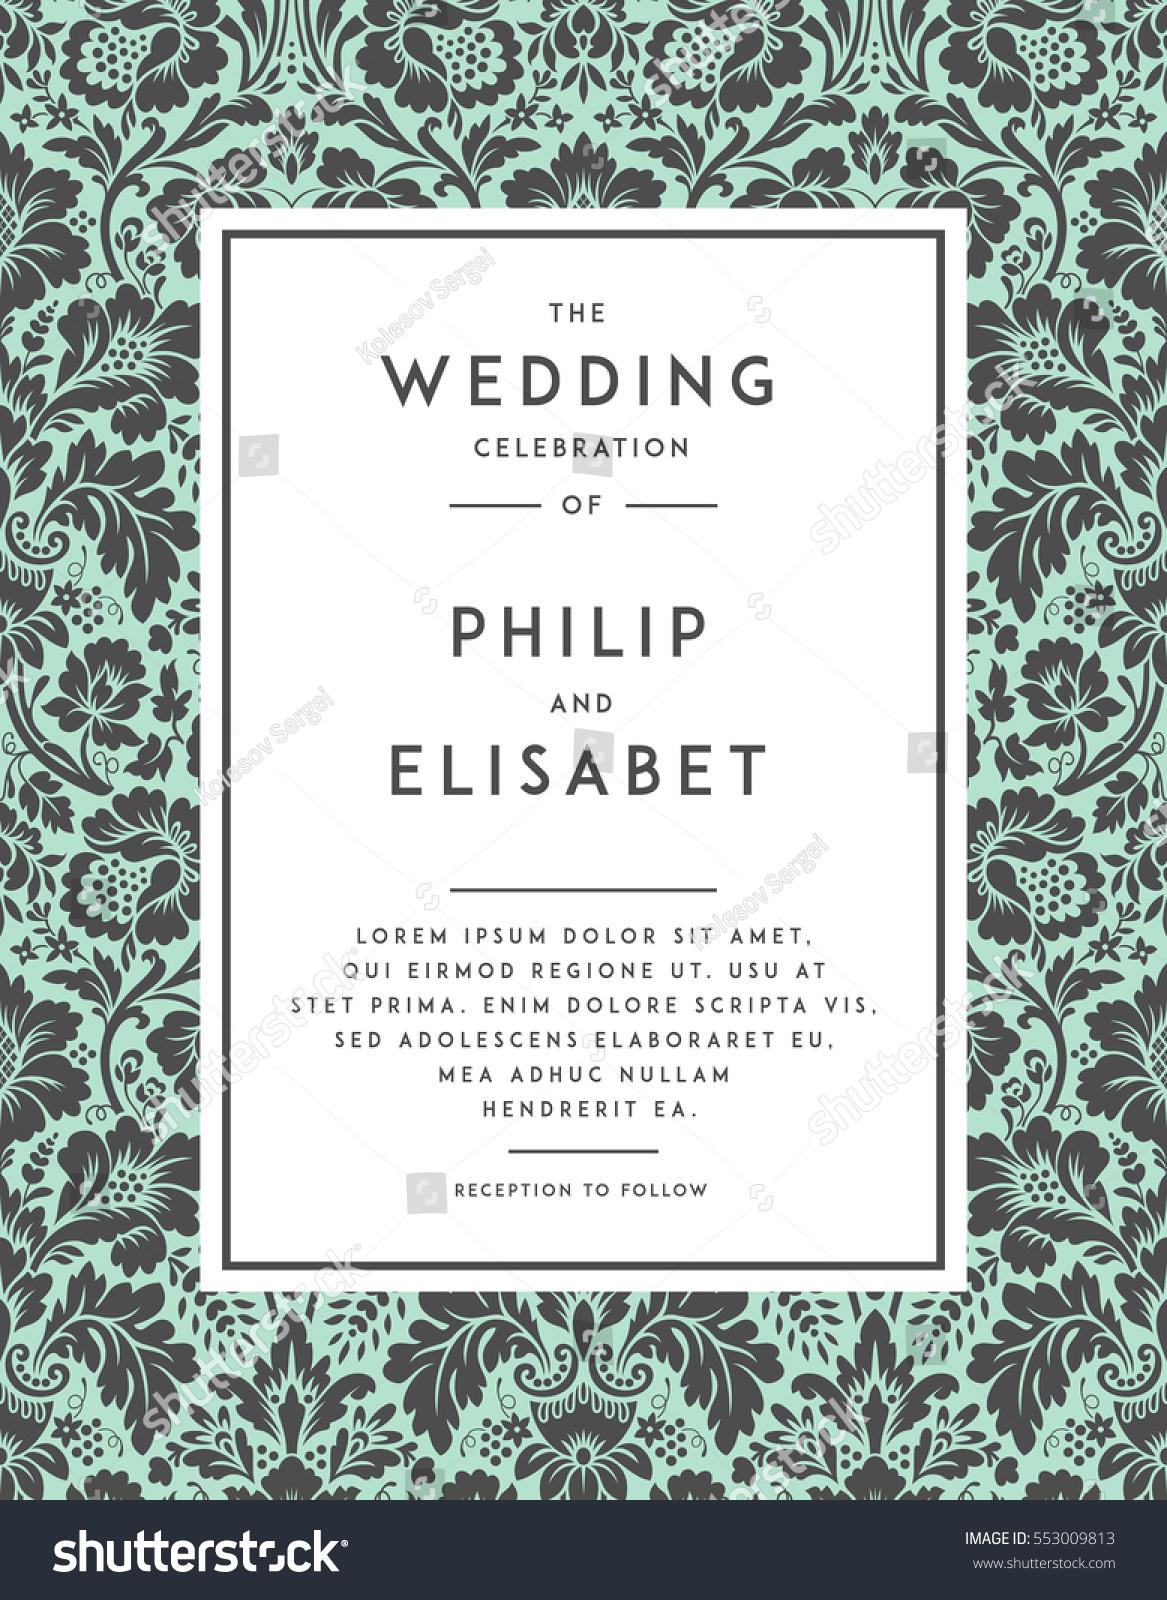 Vintage Wedding Invitation Template Modern Design Stock Vector HD ...